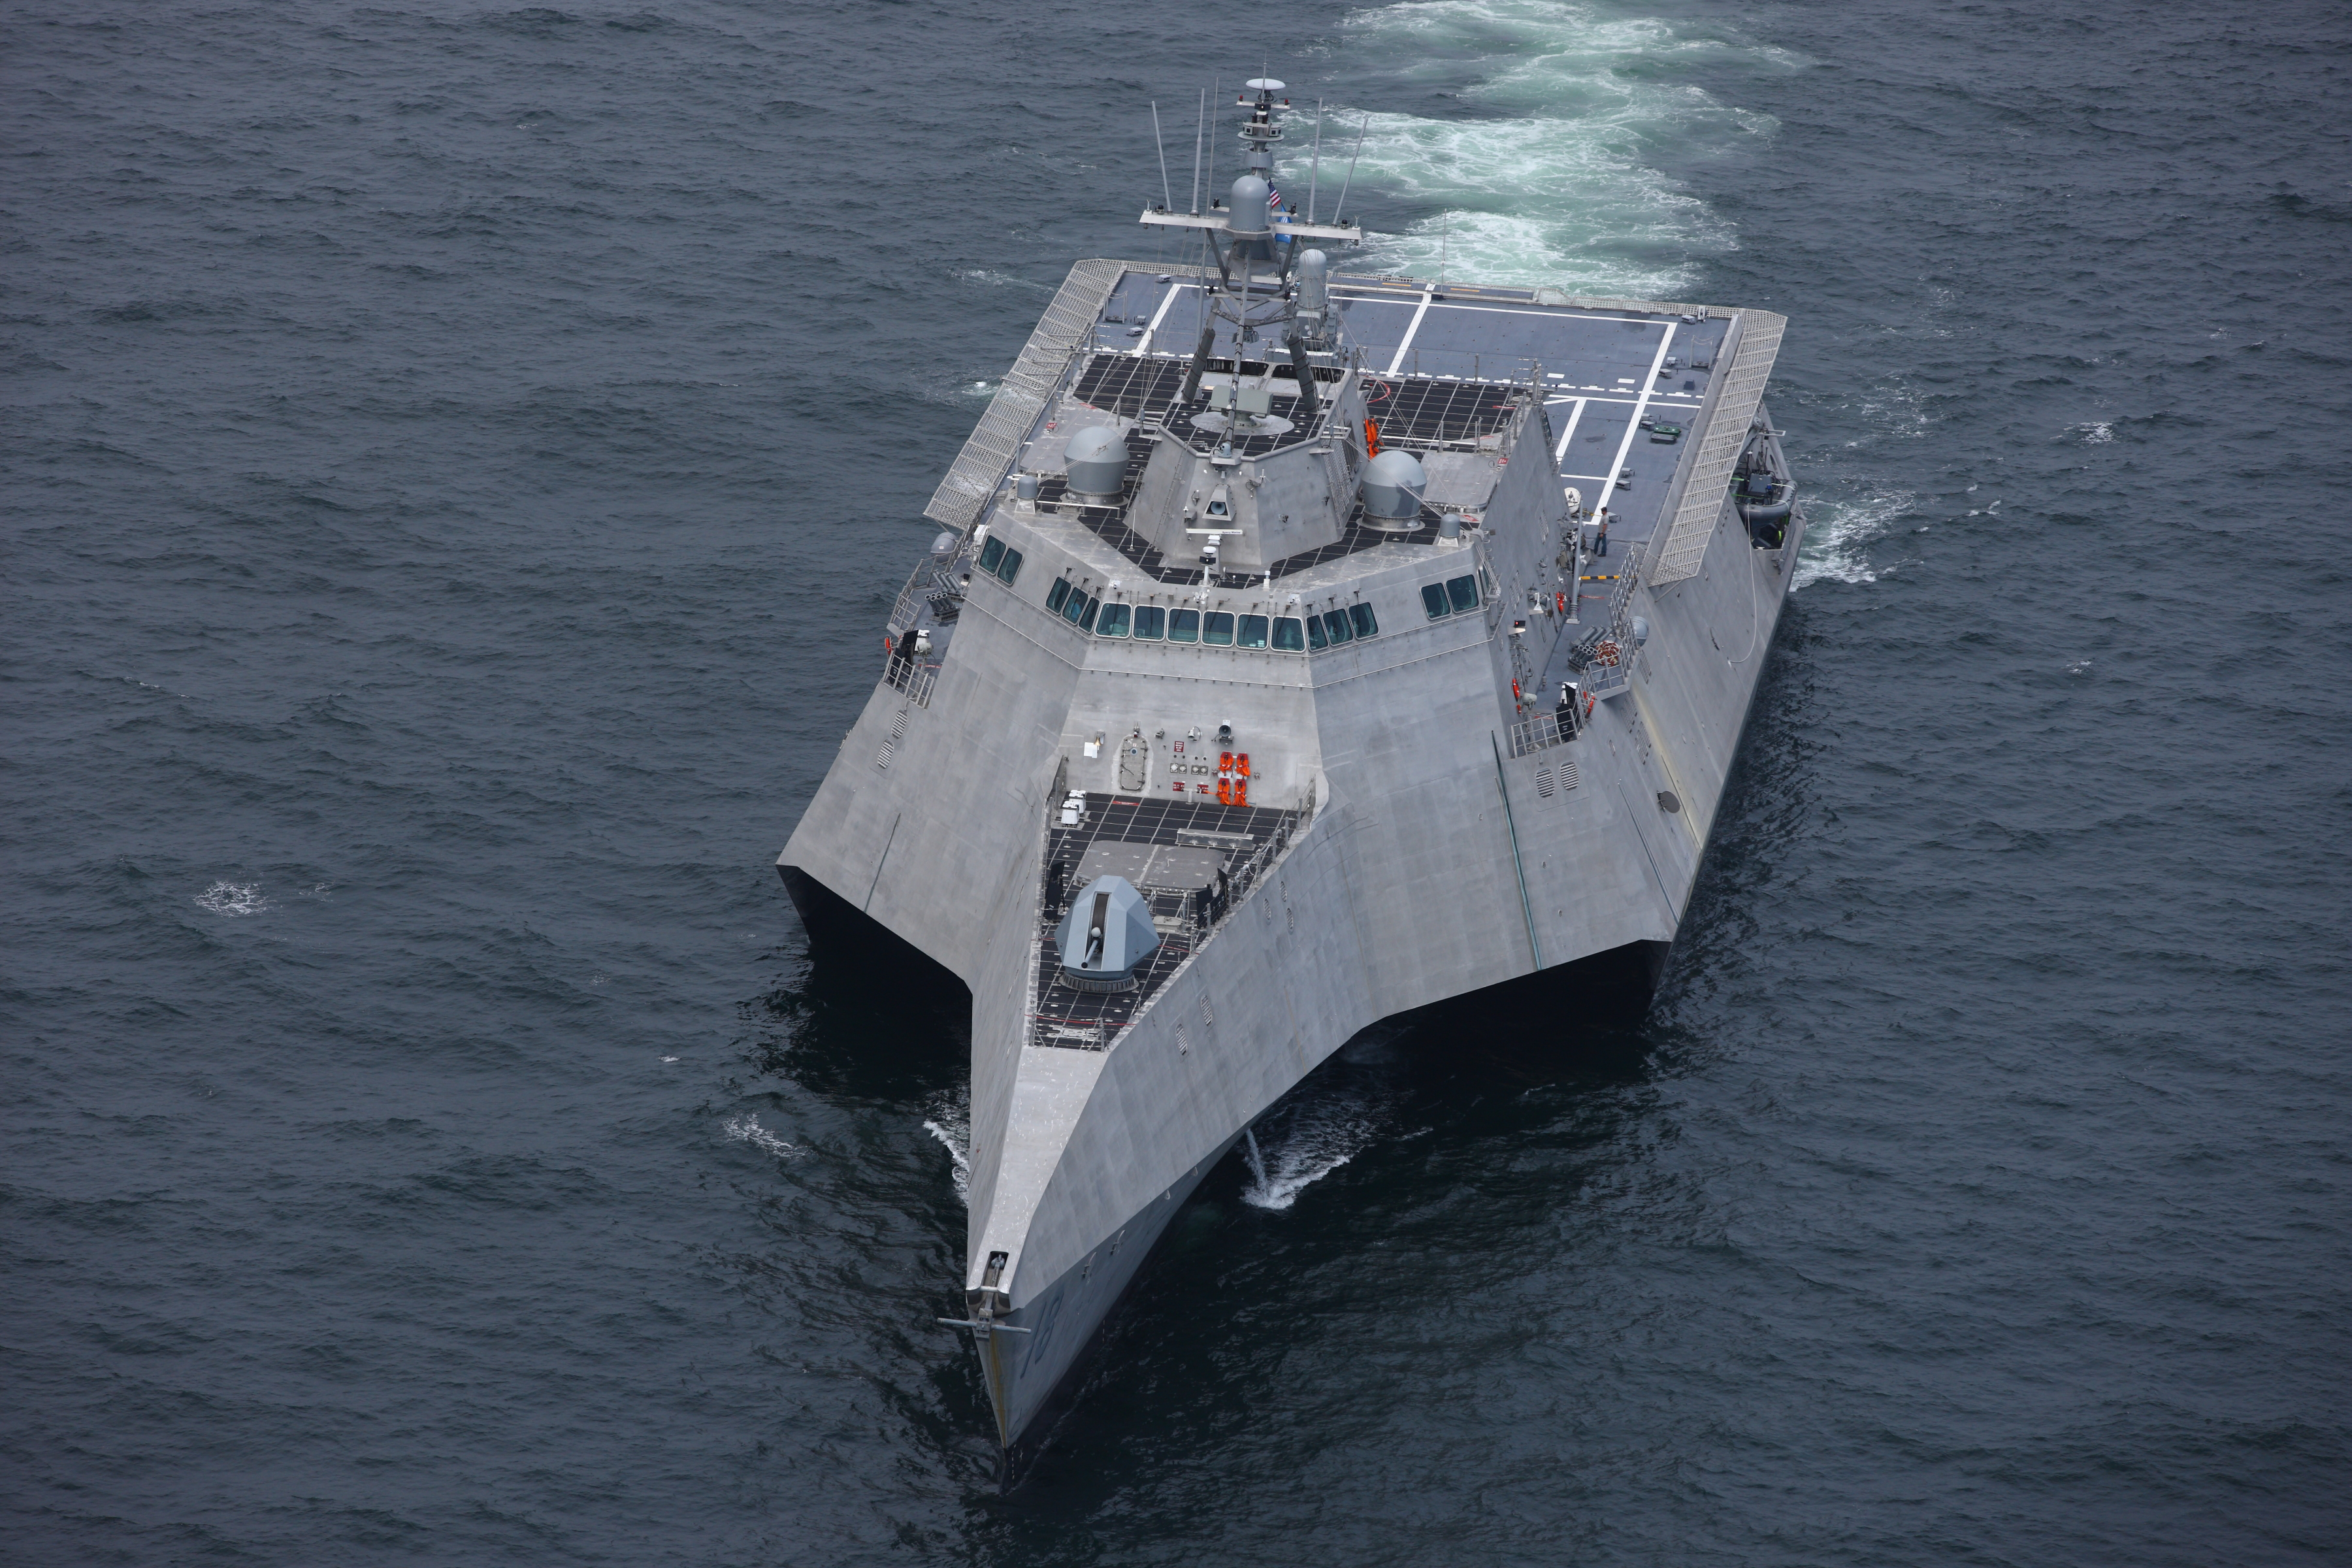 Navy Awards 2 LCSs to Austal USA